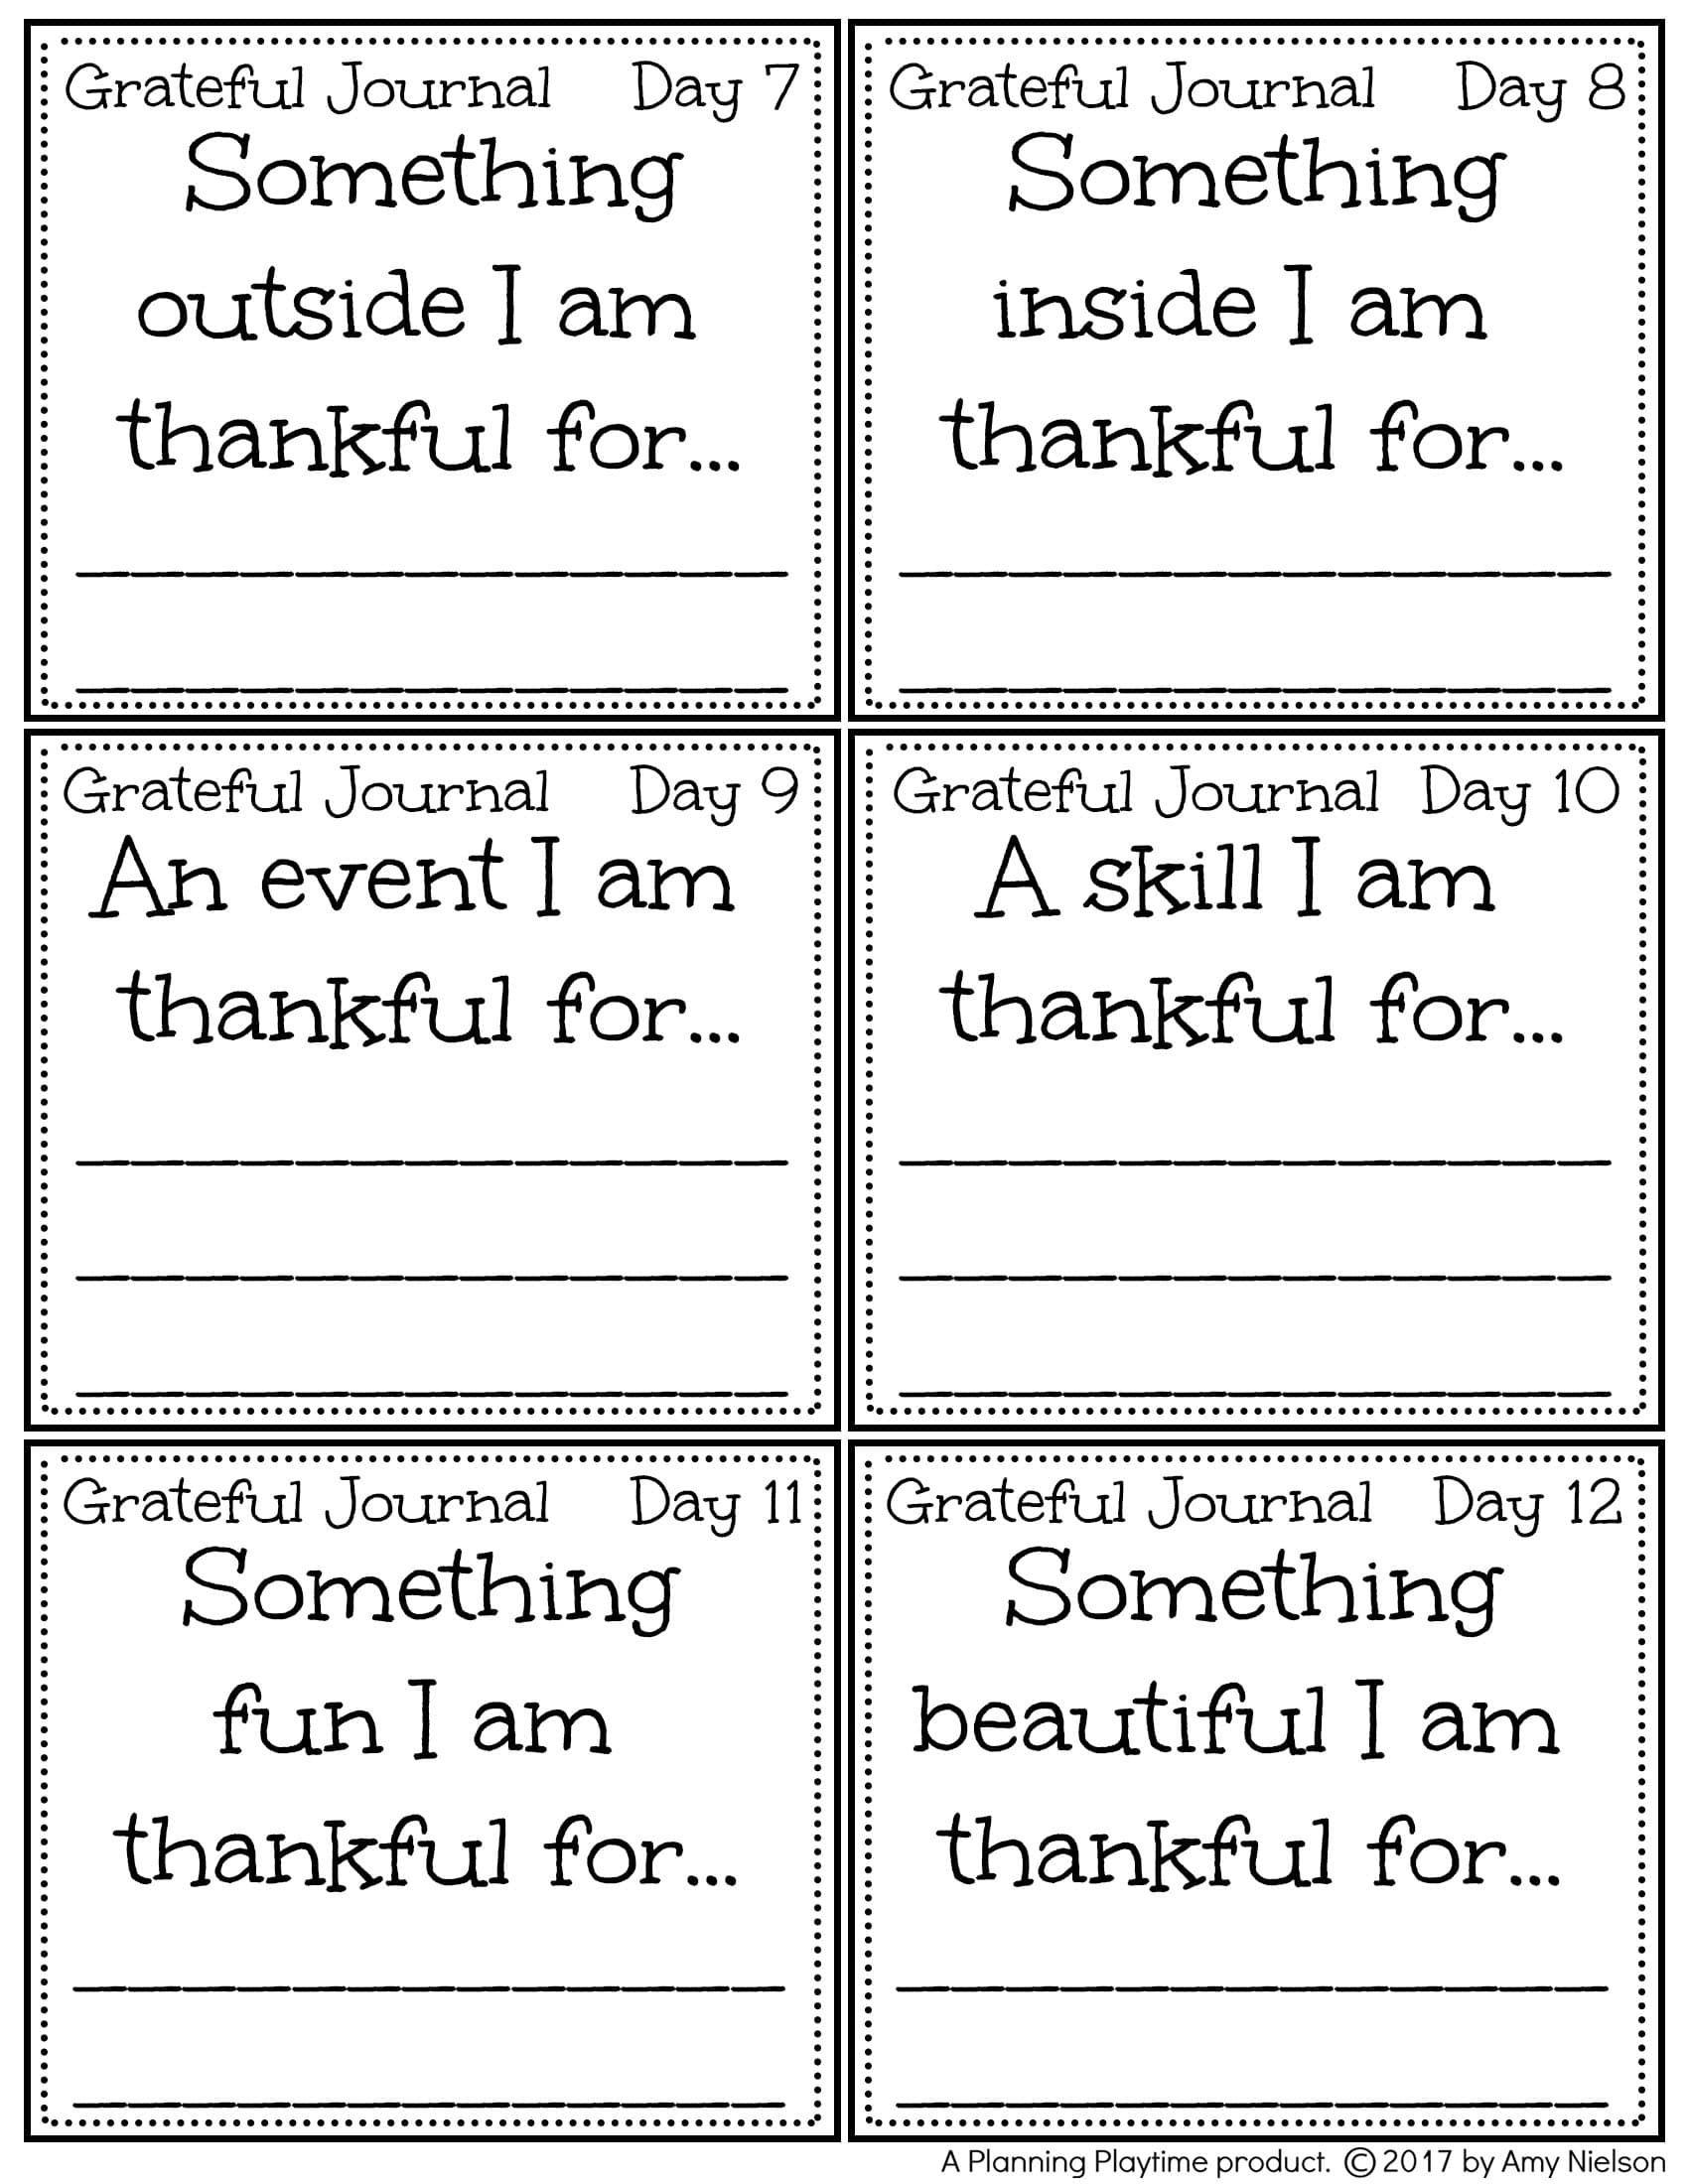 Gratitude Game Planning Playtime Journal Prompts For Kids Writing Prompts For Kids Gratitude Journal Prompts [ 2200 x 1700 Pixel ]